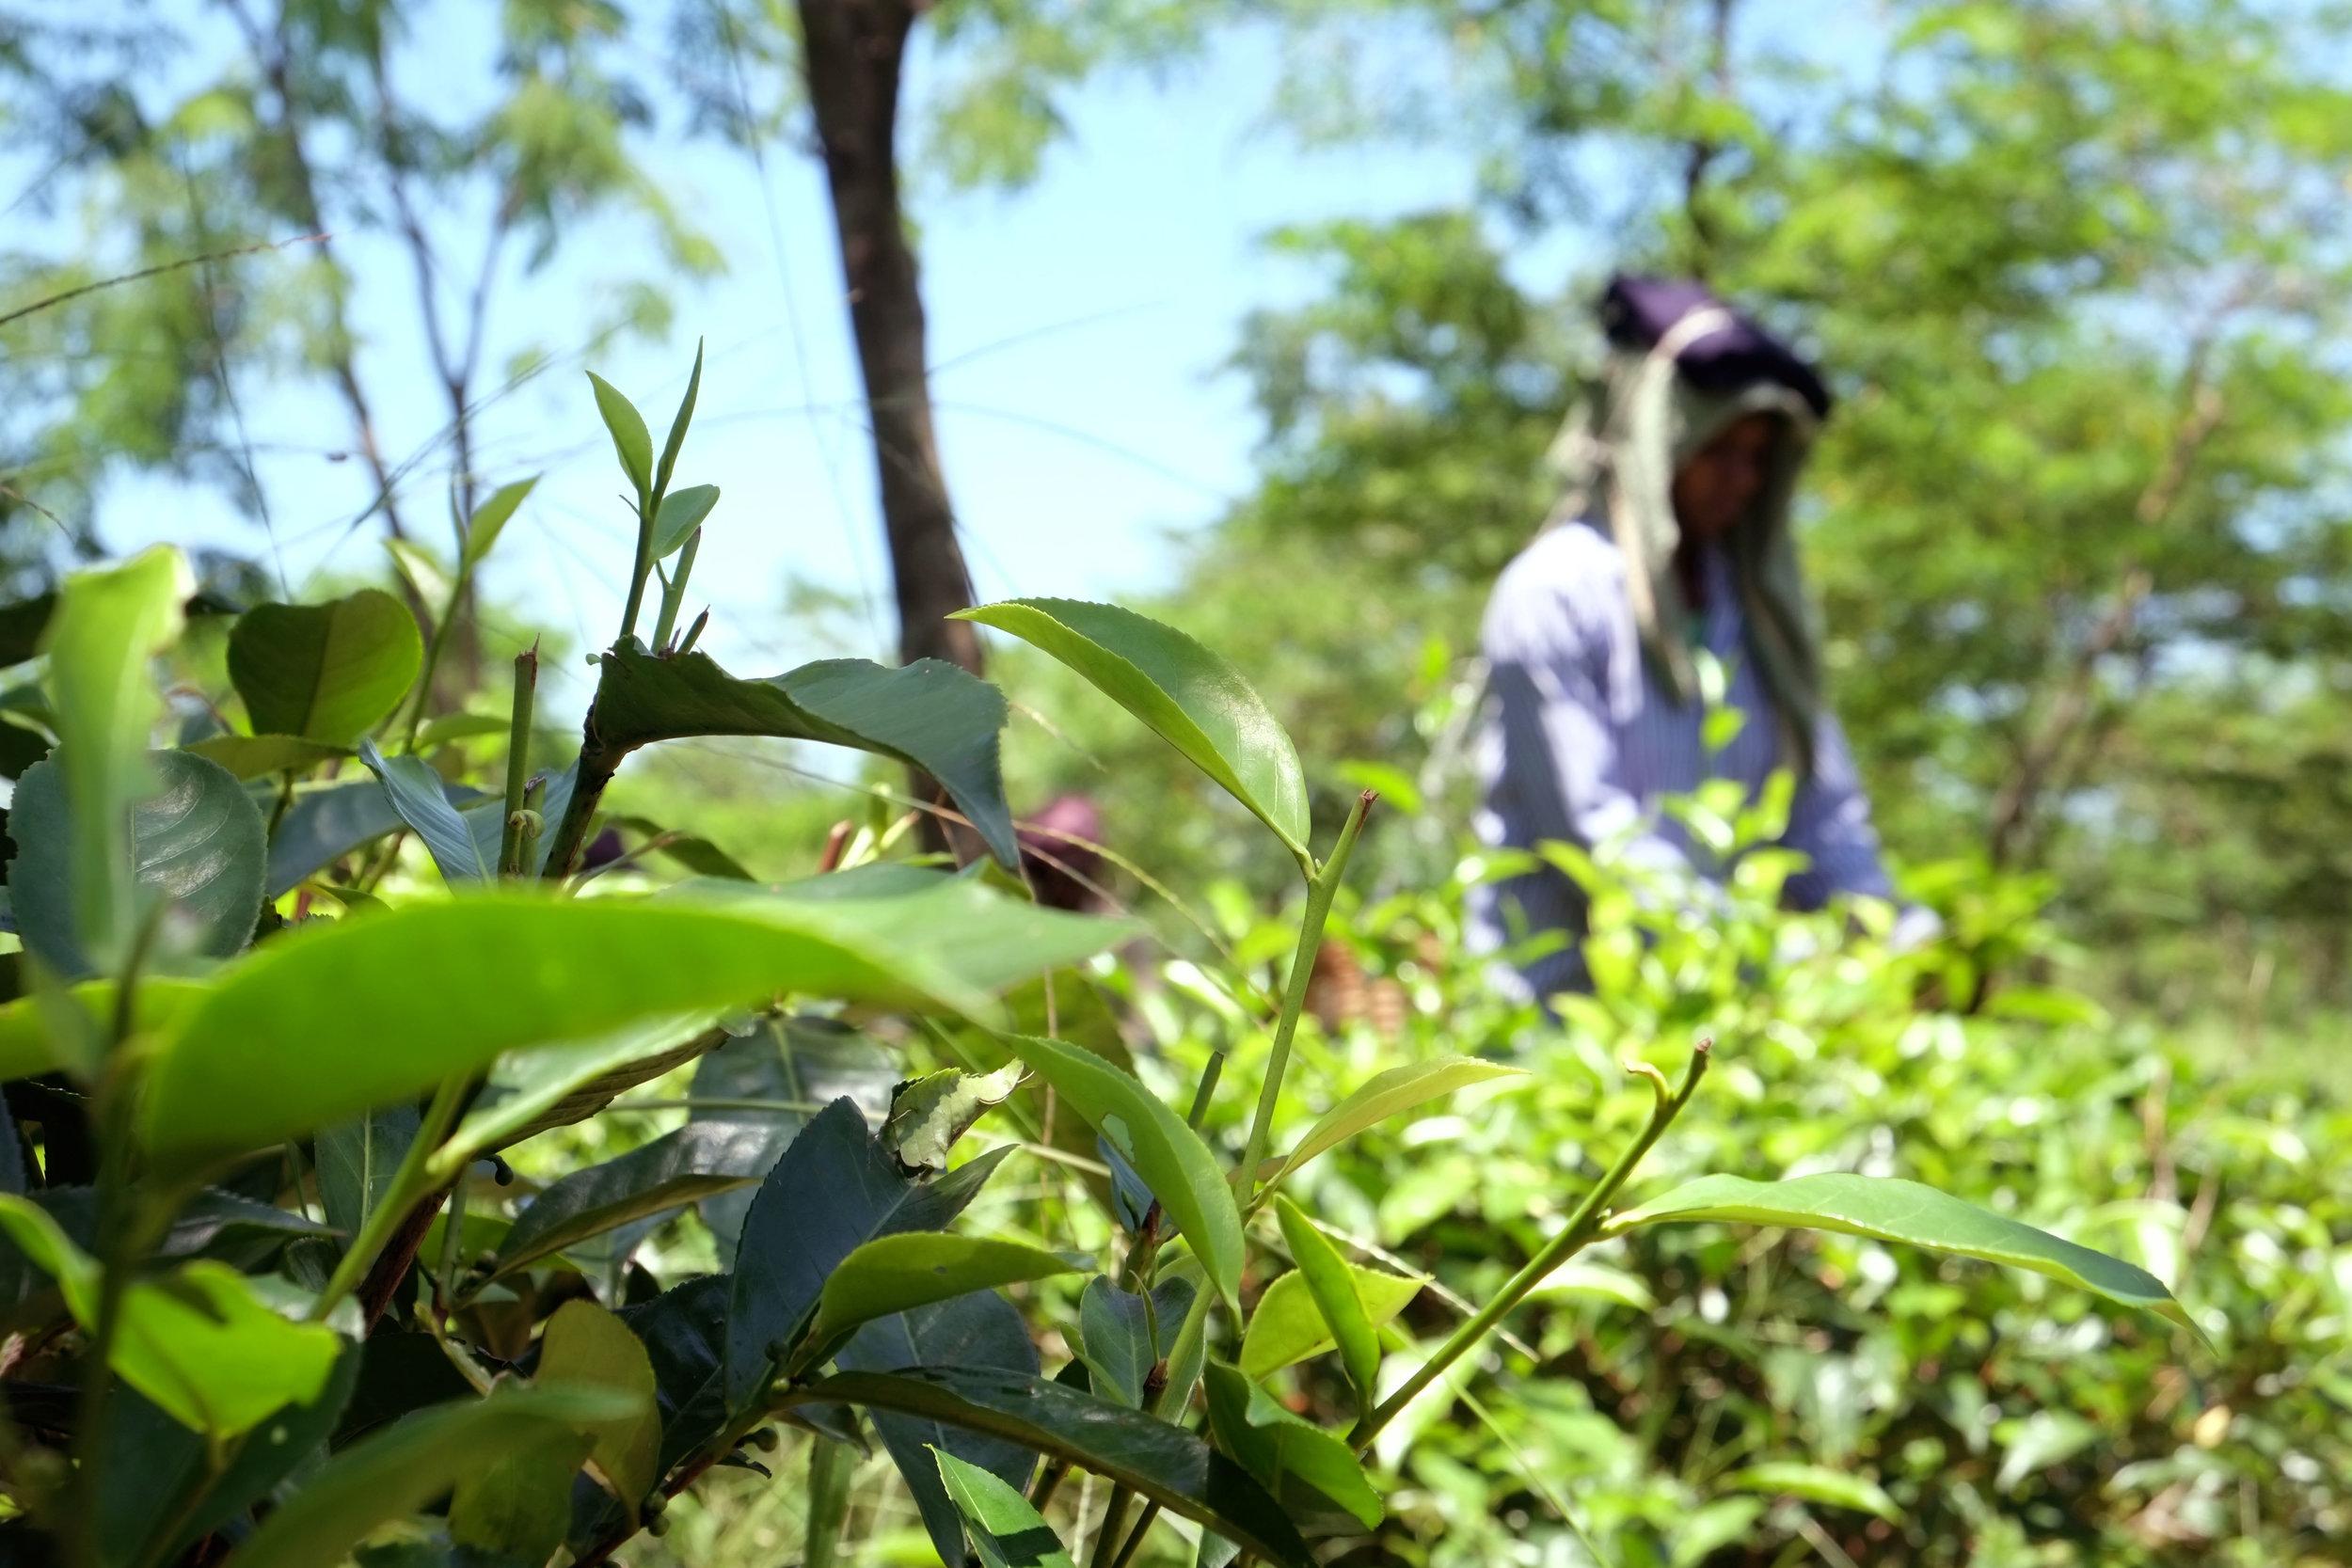 Lesly Lotha_Tea Garden_Assam_India_2016 - 04